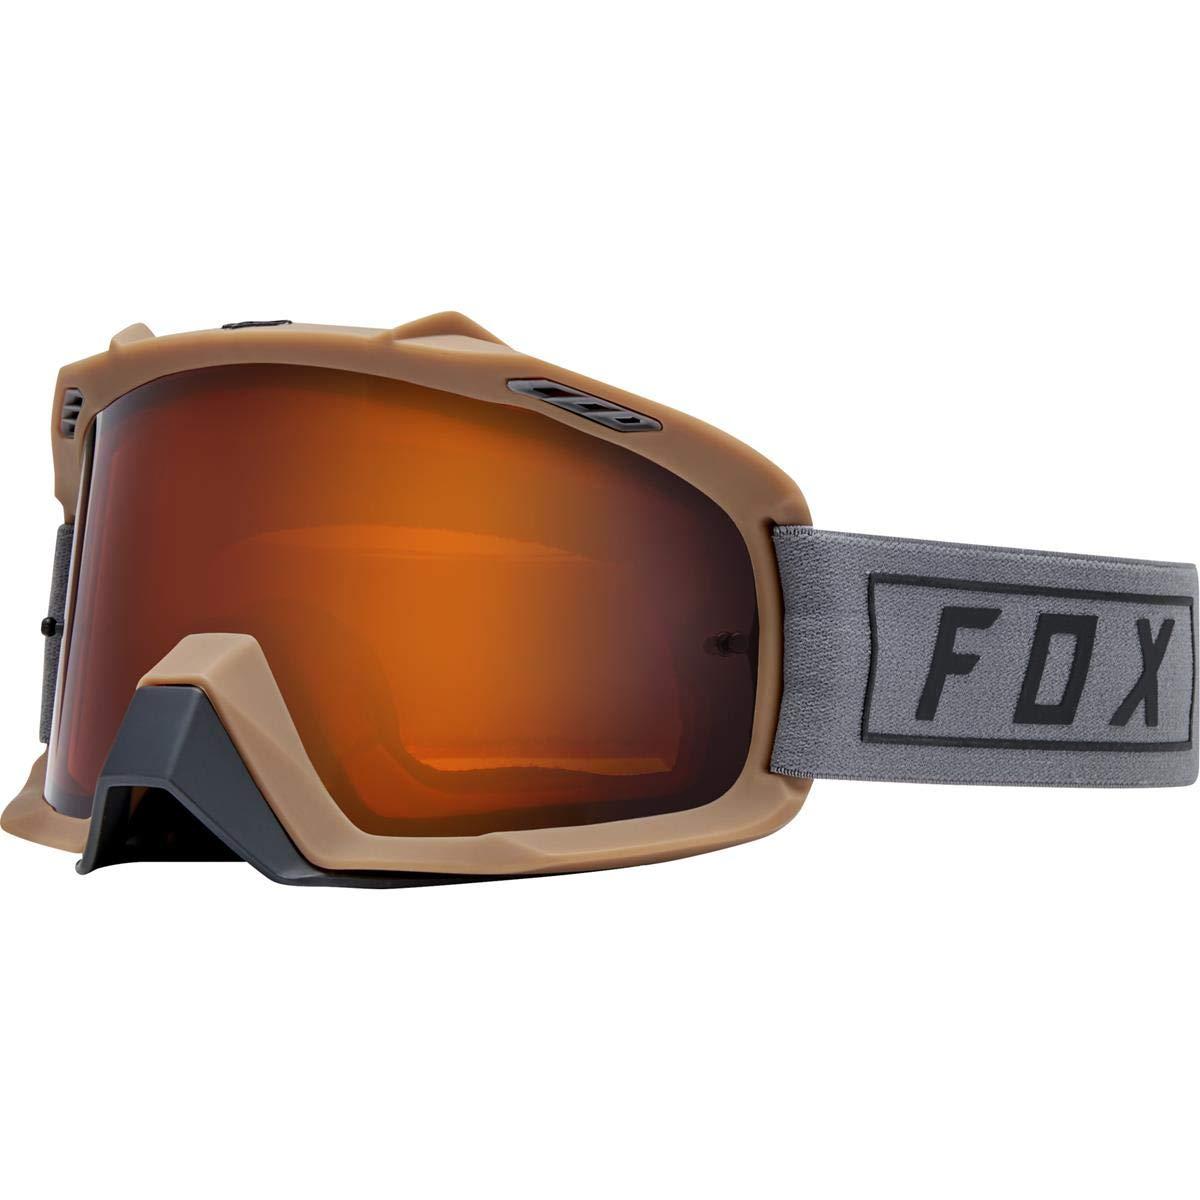 Fox Brille Air Space Enduro - Glas Dual Orange, Grey, Größe OS Größe OS FOX HEAD EUROPE S.L.U. 22679-006-OS